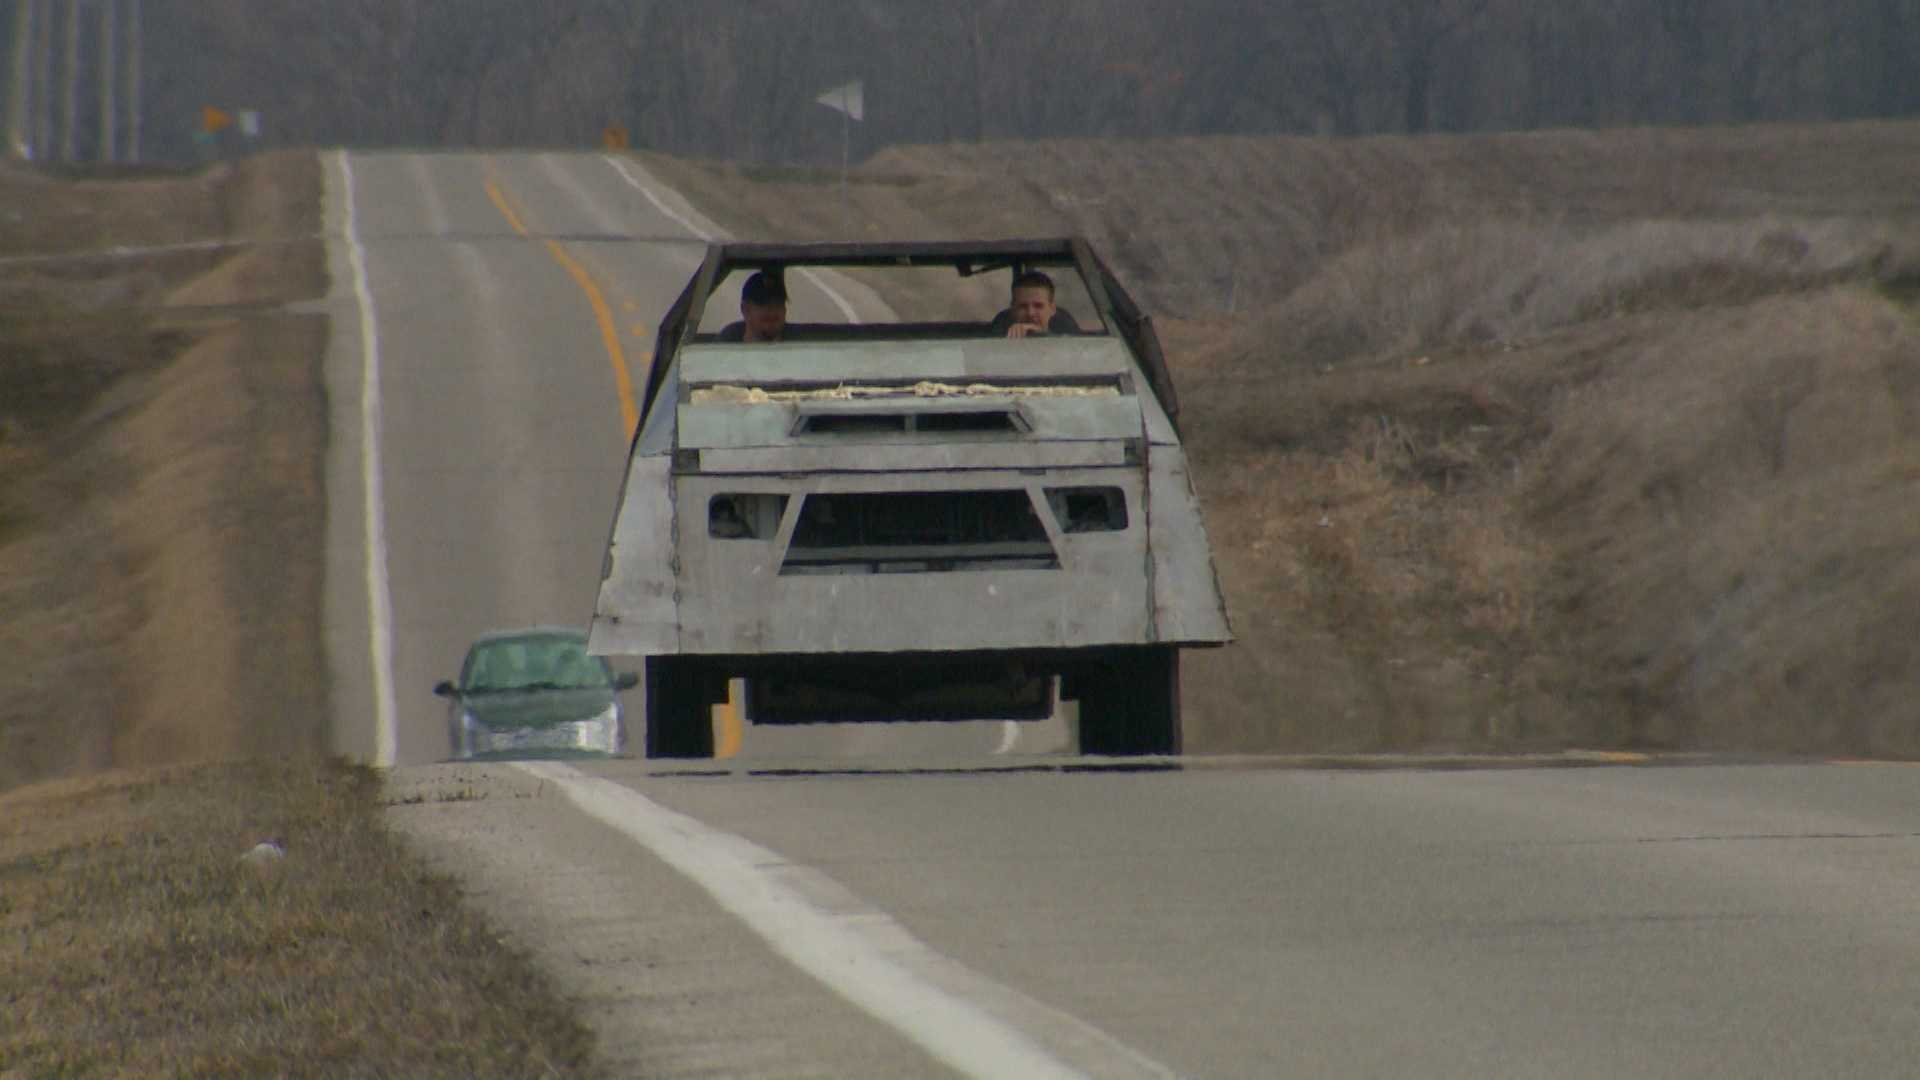 Tornado Intercept Vehicle